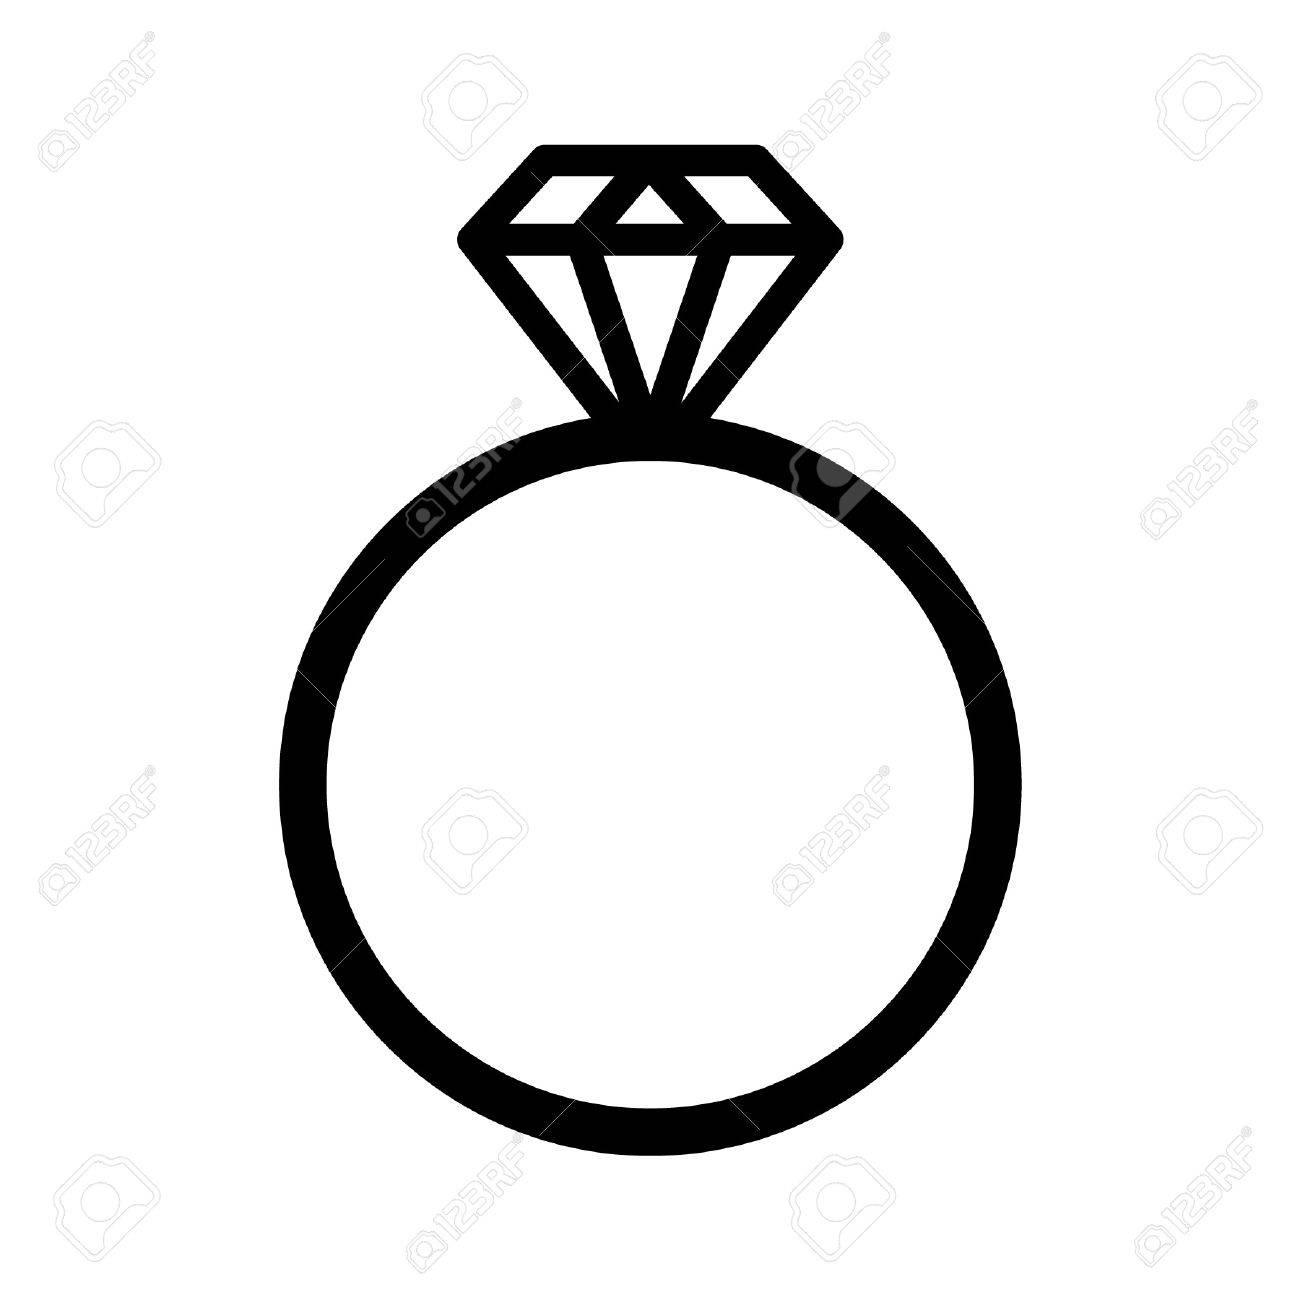 Diamond Engagement Ring Line Art Icon For Websites Stock Vector  42562306